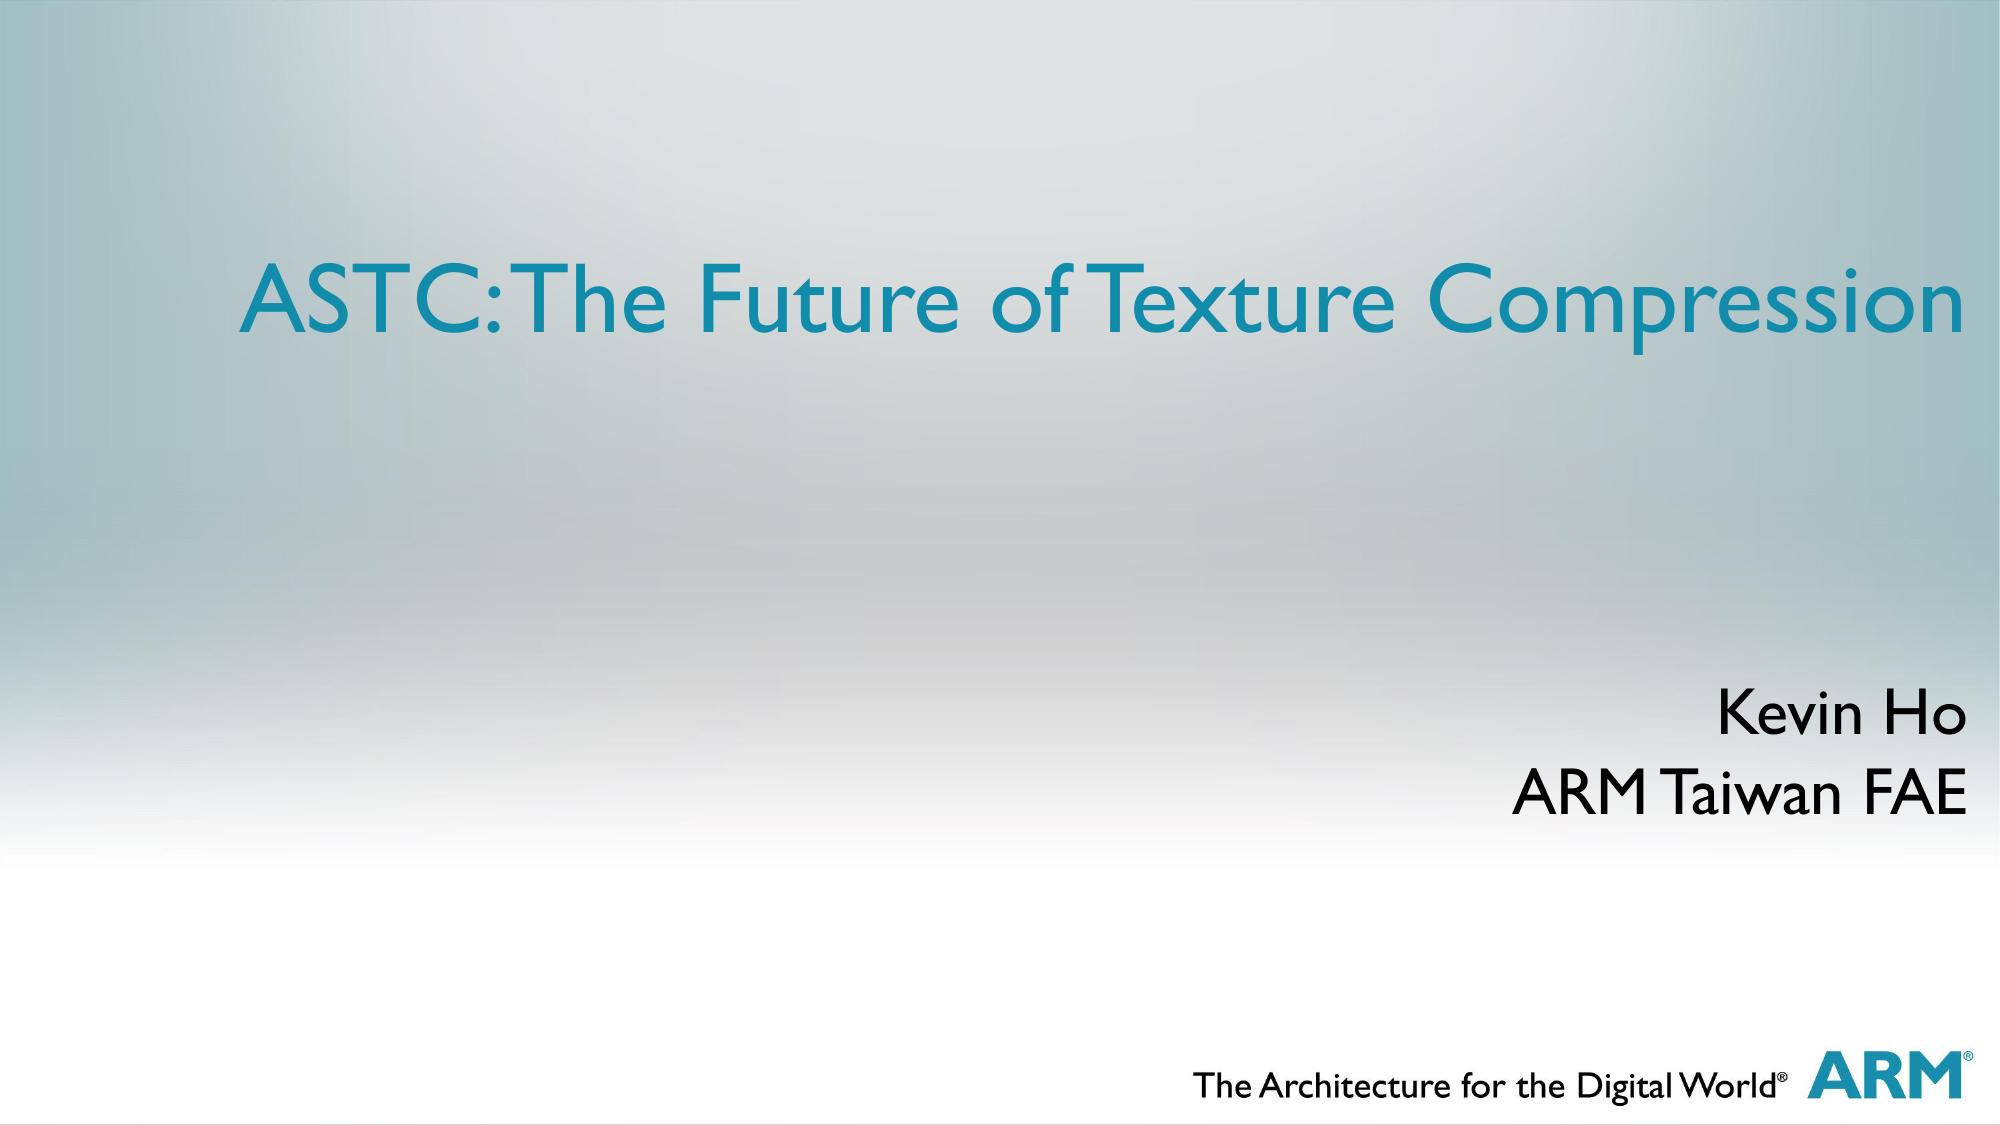 ASTC: The Future of Texture Compression | manualzz com